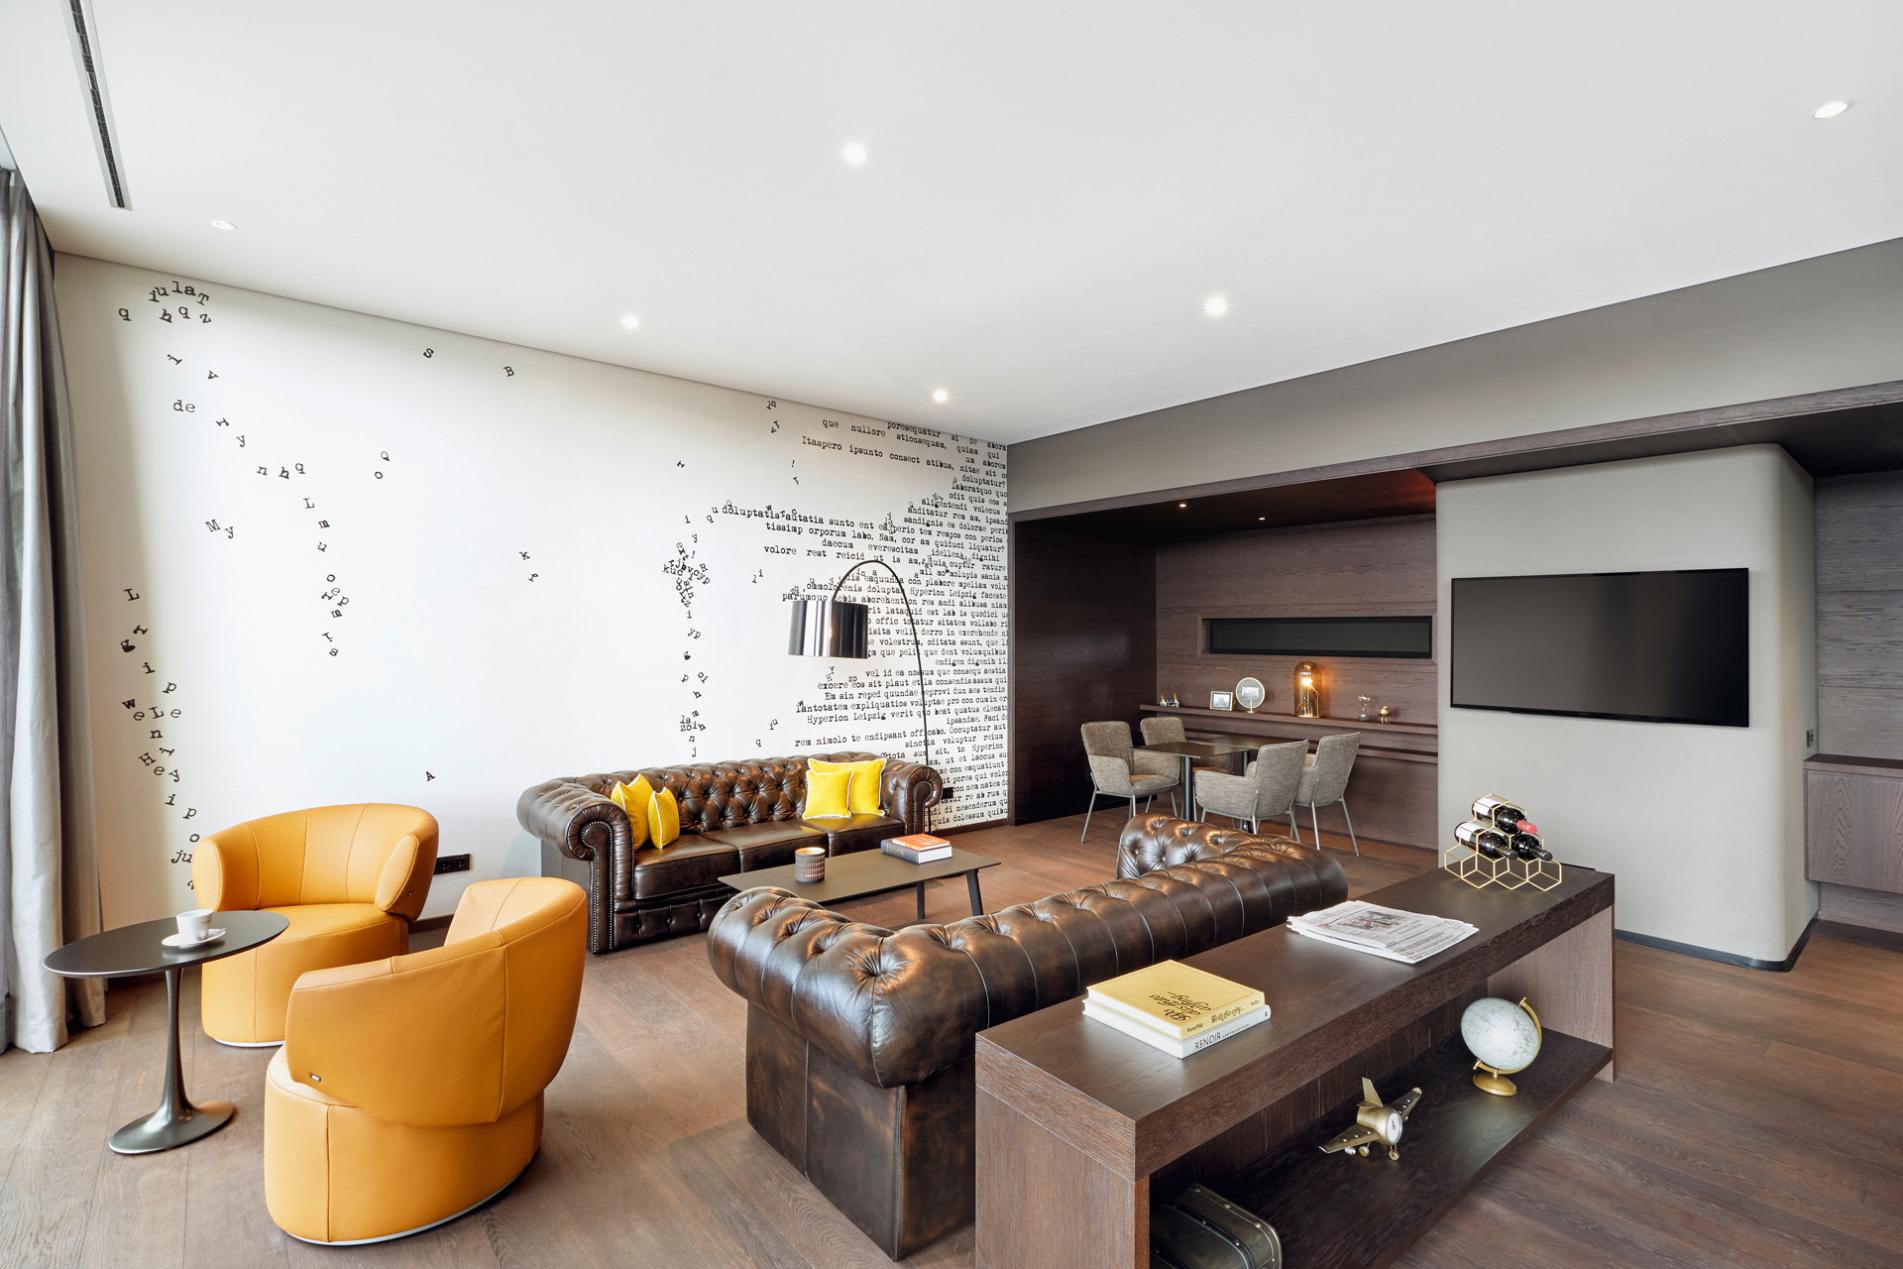 H Hotels Executive Lounge 06 Hyperion Hotel Leipzig Original (kommerz